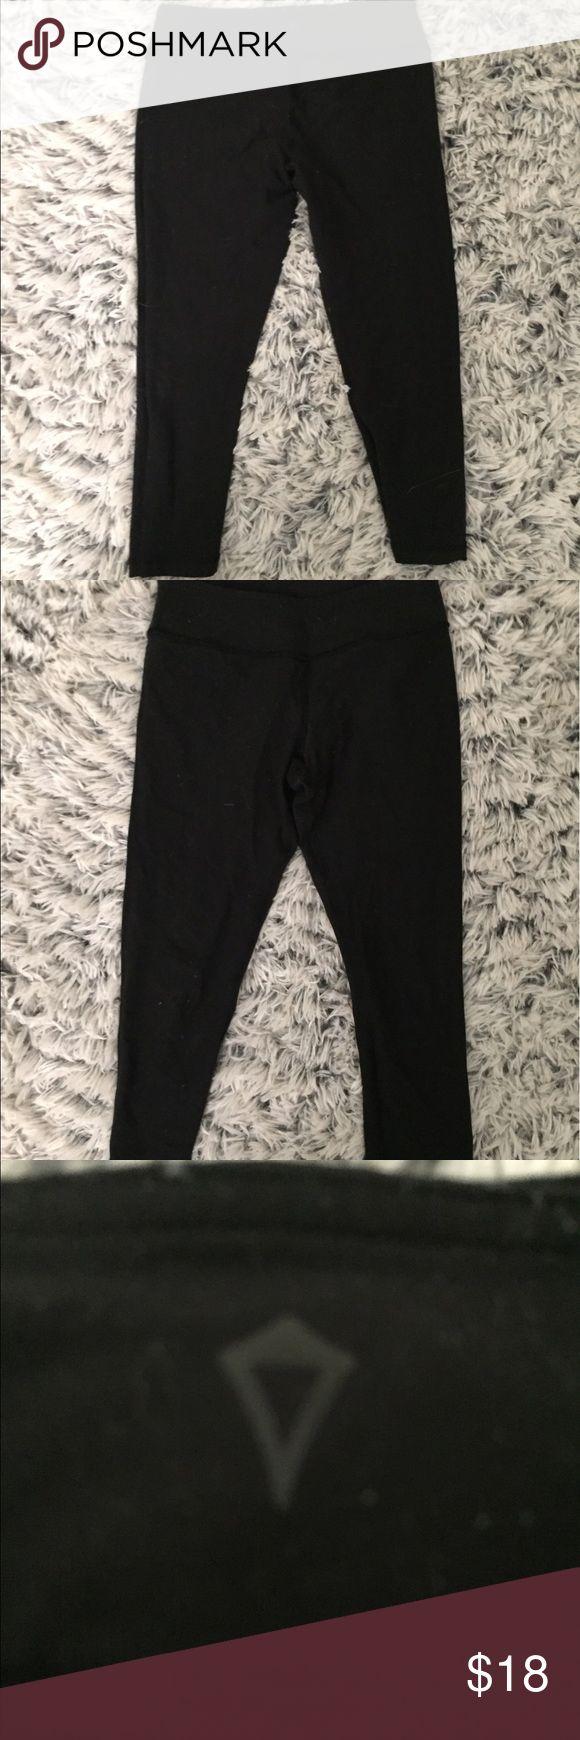 LULULEMON IVIVVA KIDS CAPRI LEGGINGS SIZE 12 The Lululemon's kids brand black Capri leggings in size 12. Very good condition. Ivivva Pants Capris